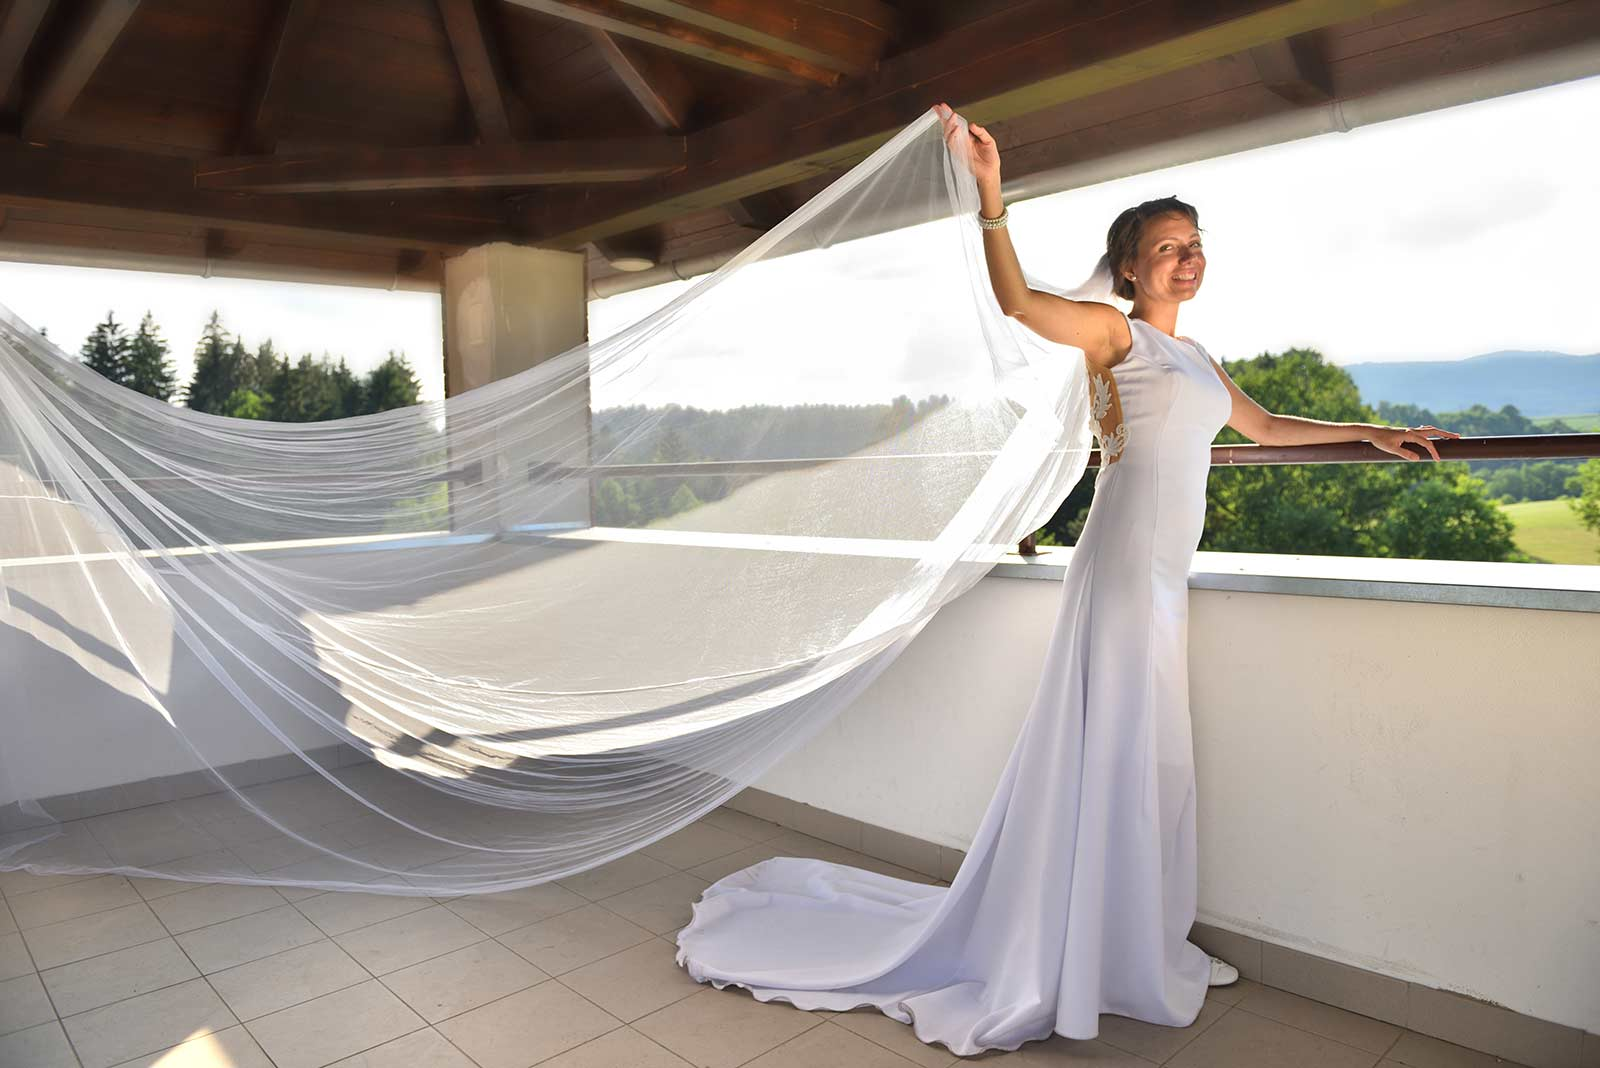 30 svatebni foto svachova lhotka svatebni fotograf ales motejl jihocesky kraj